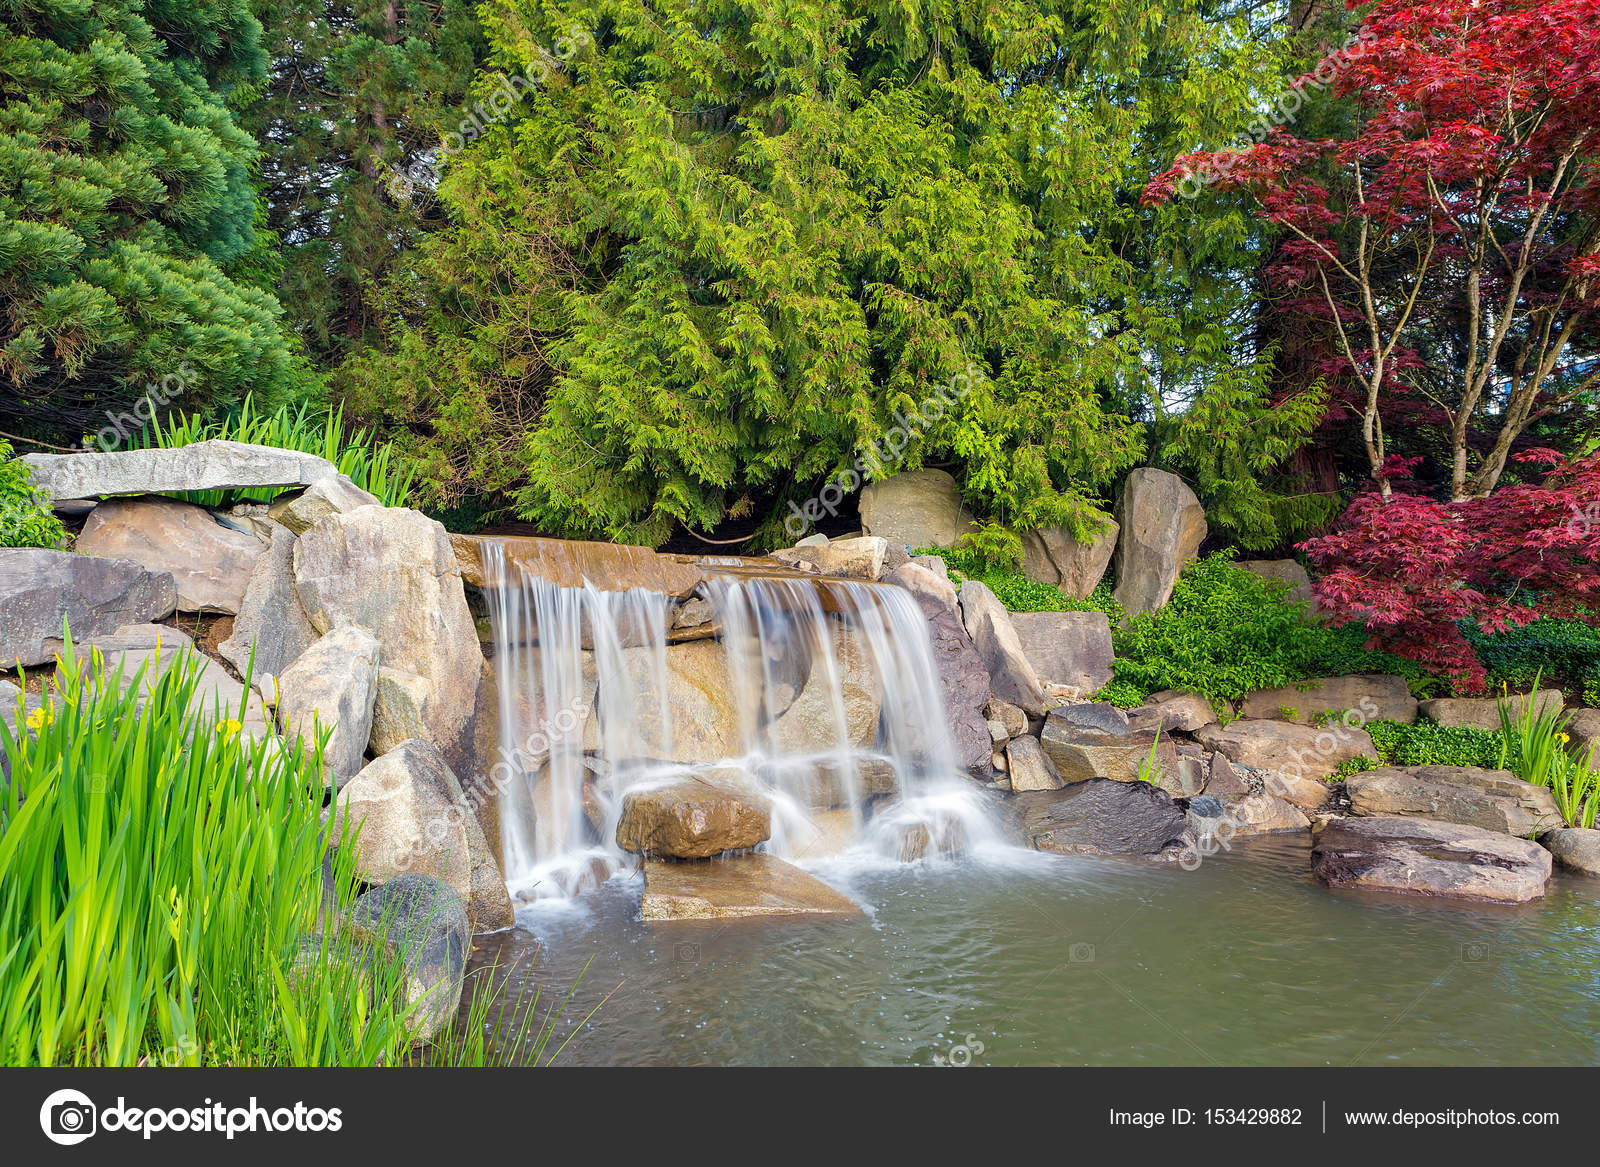 Cascada estanque jardin jard n paisaje con cascada y for Estanque de jardin con cascada